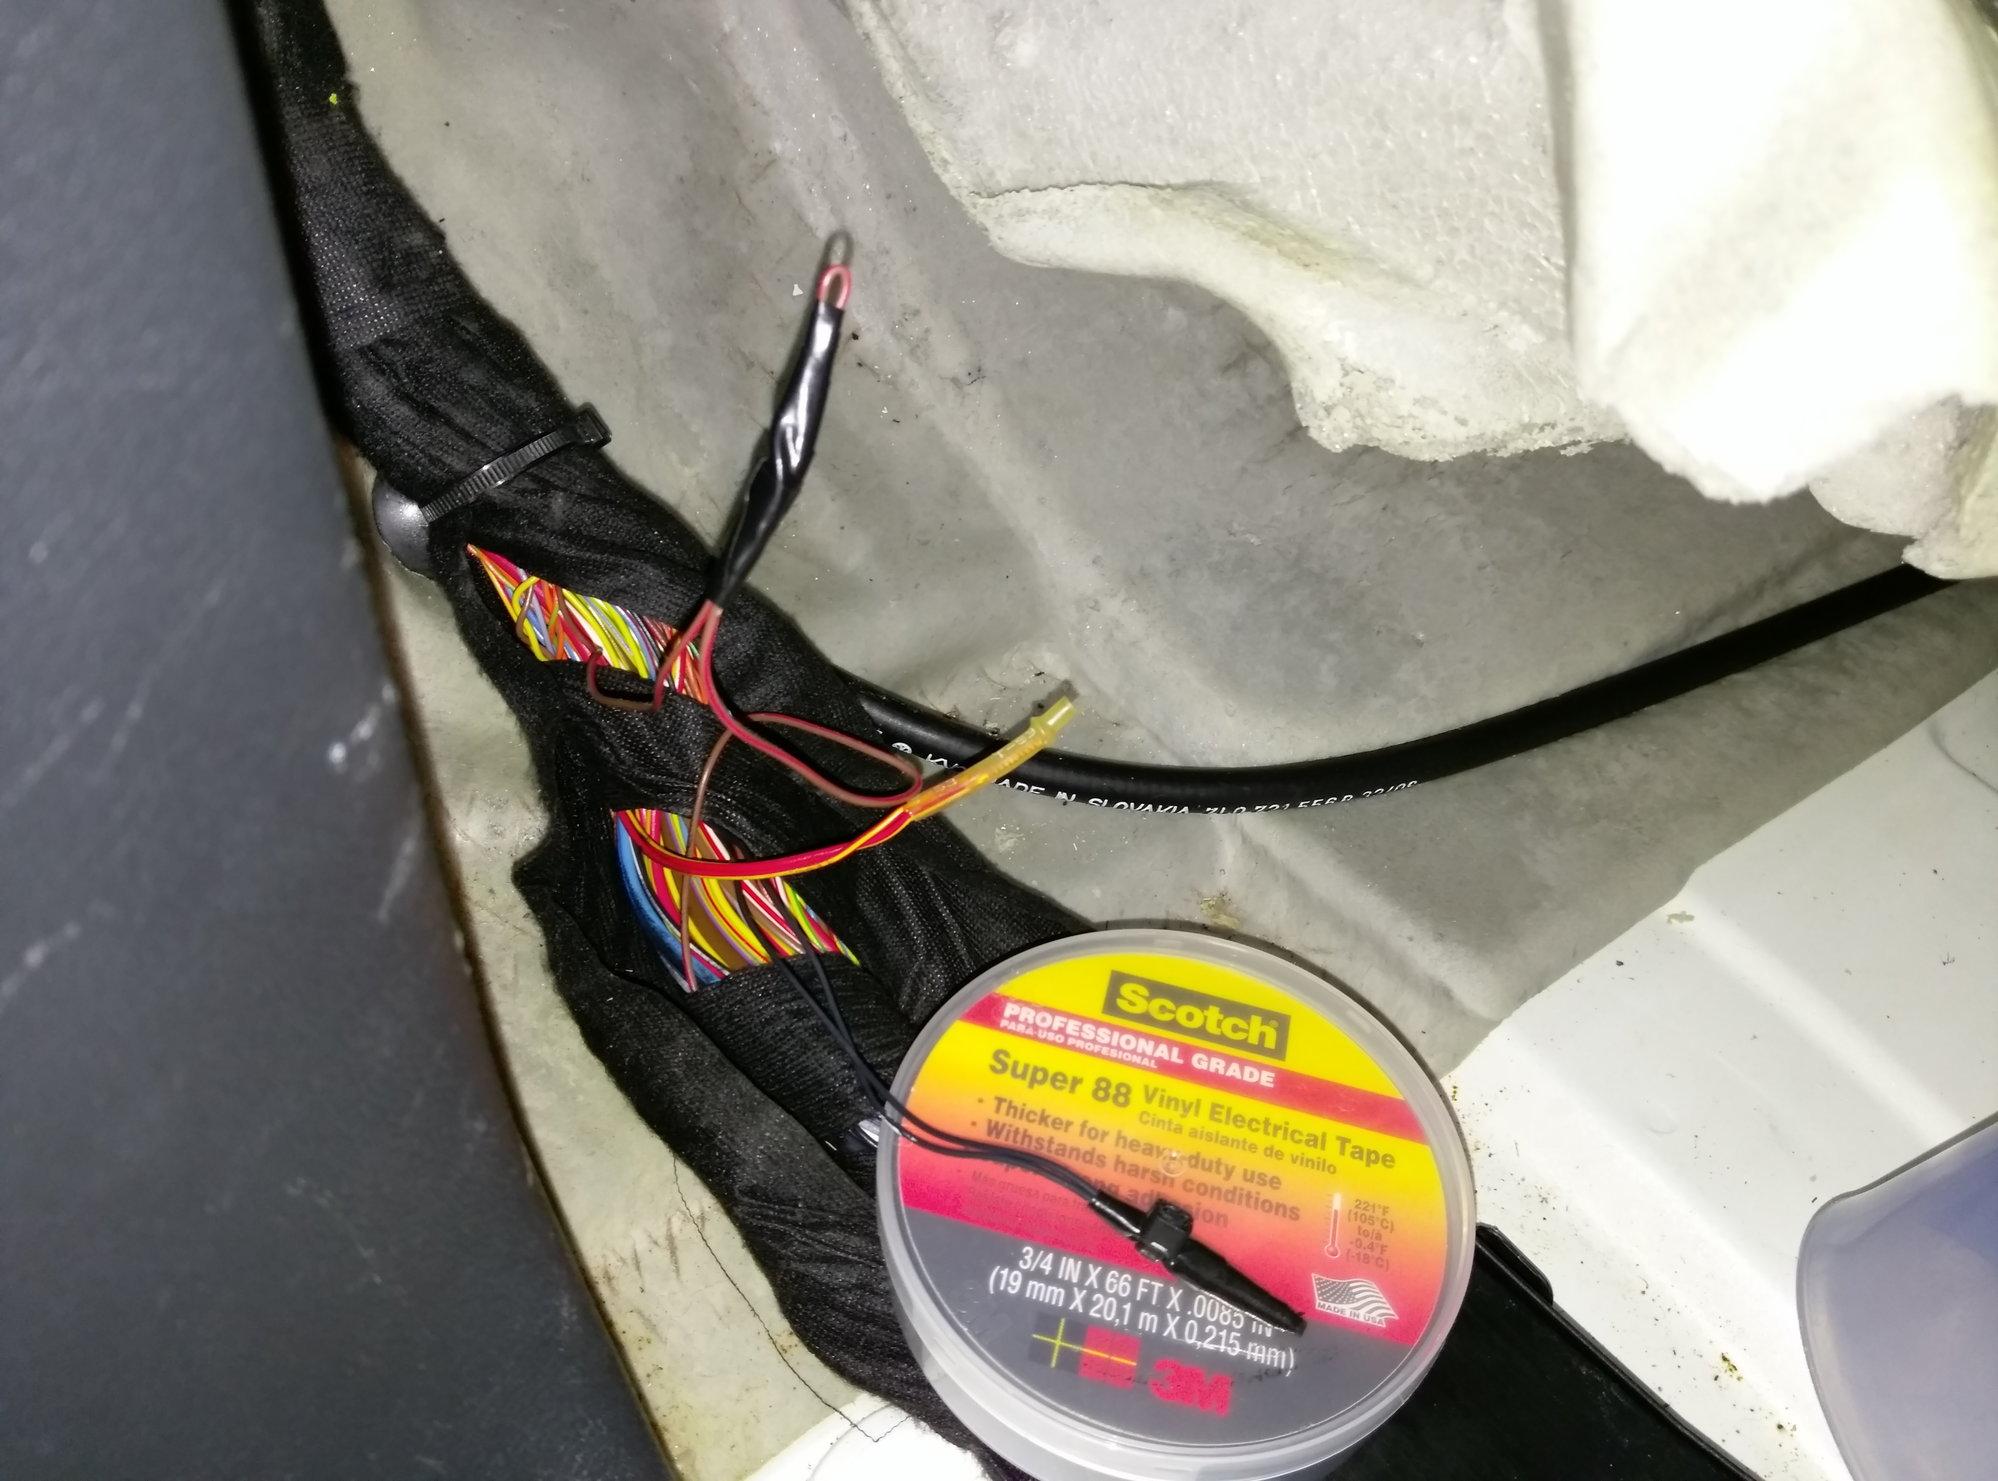 955/957/958 Cayenne DIY: Wiring problems due to moisture ... on